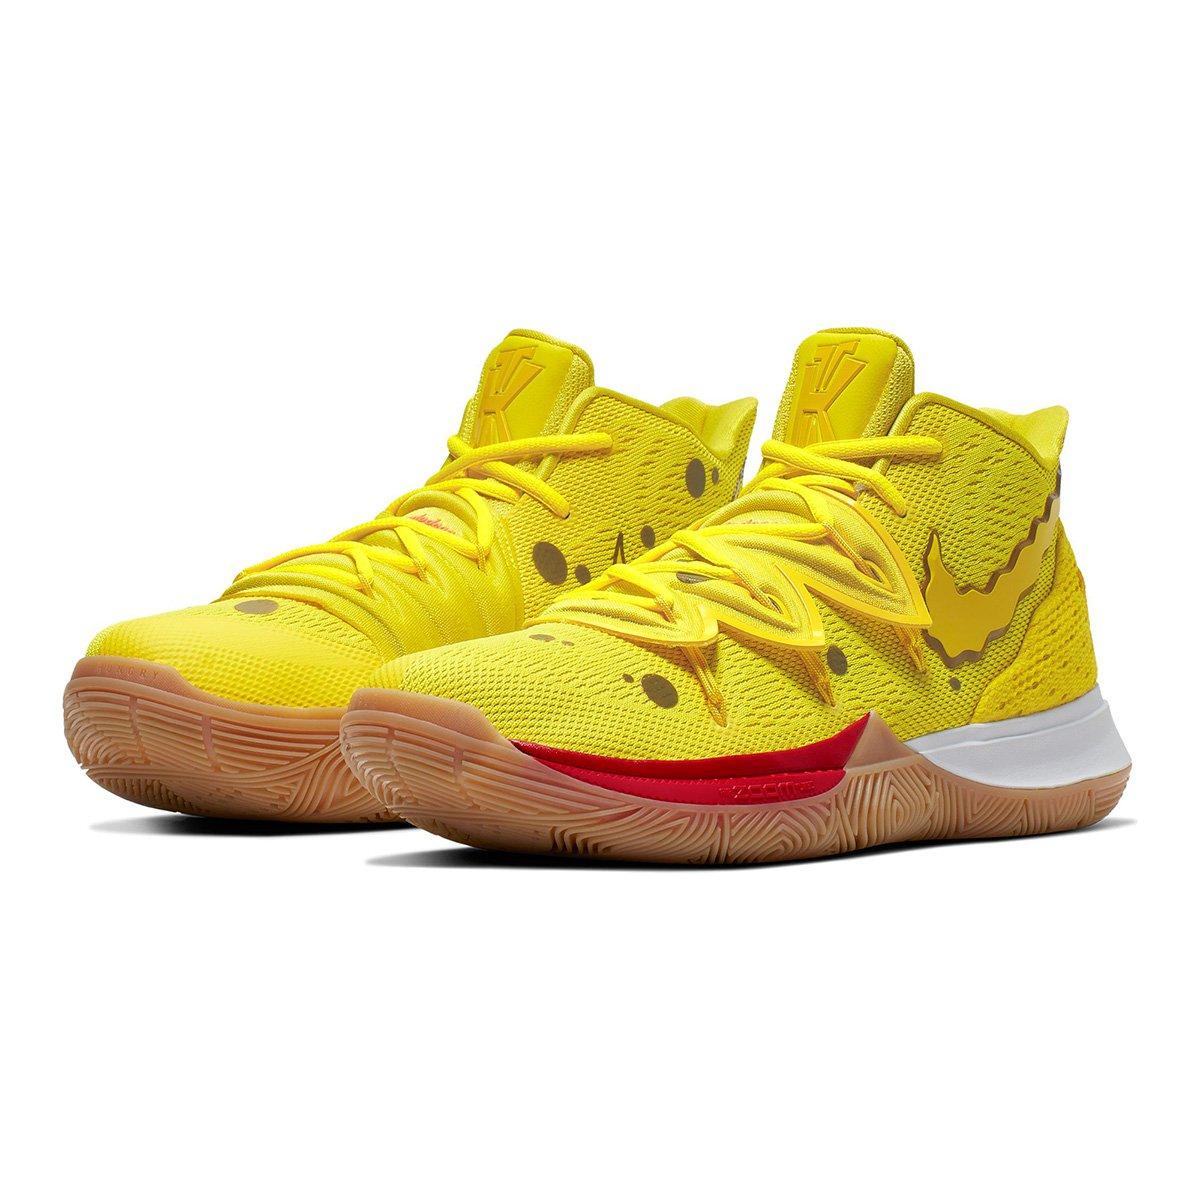 Tênis Nike Kyrie 5 SpongeBob SquarePants Masculino